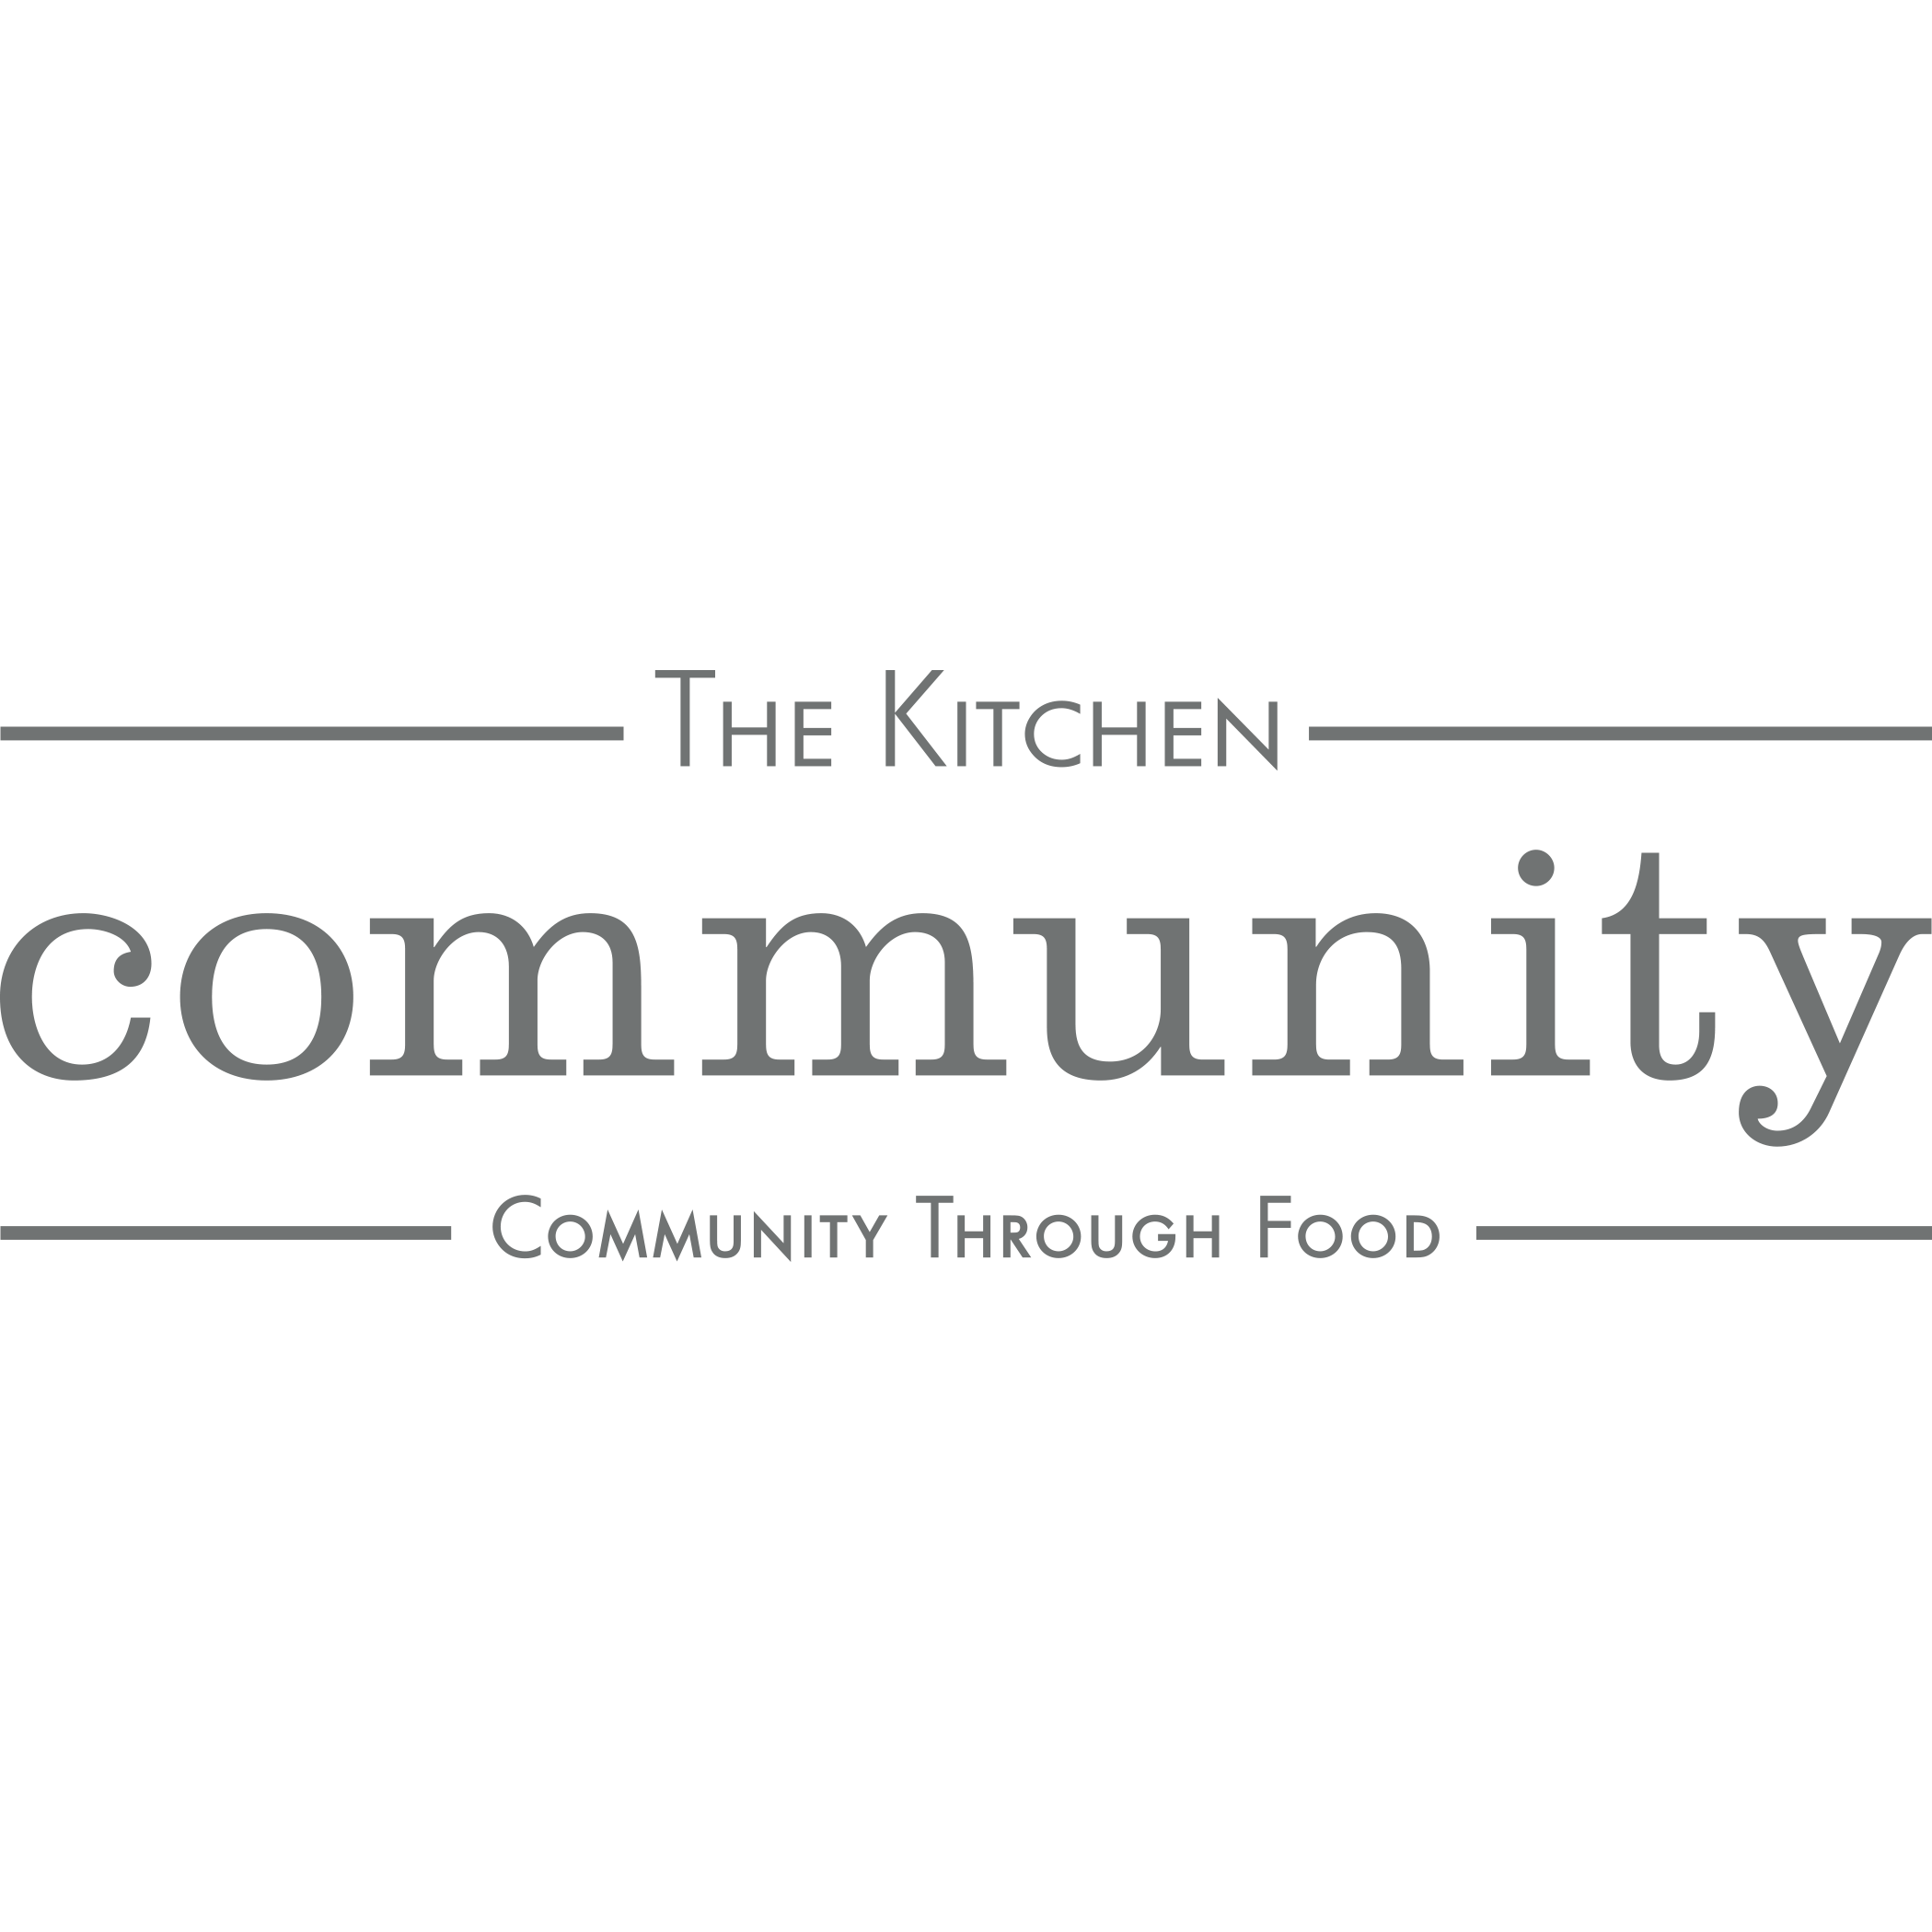 The Kitchen Community — New Belgium Family Foundation